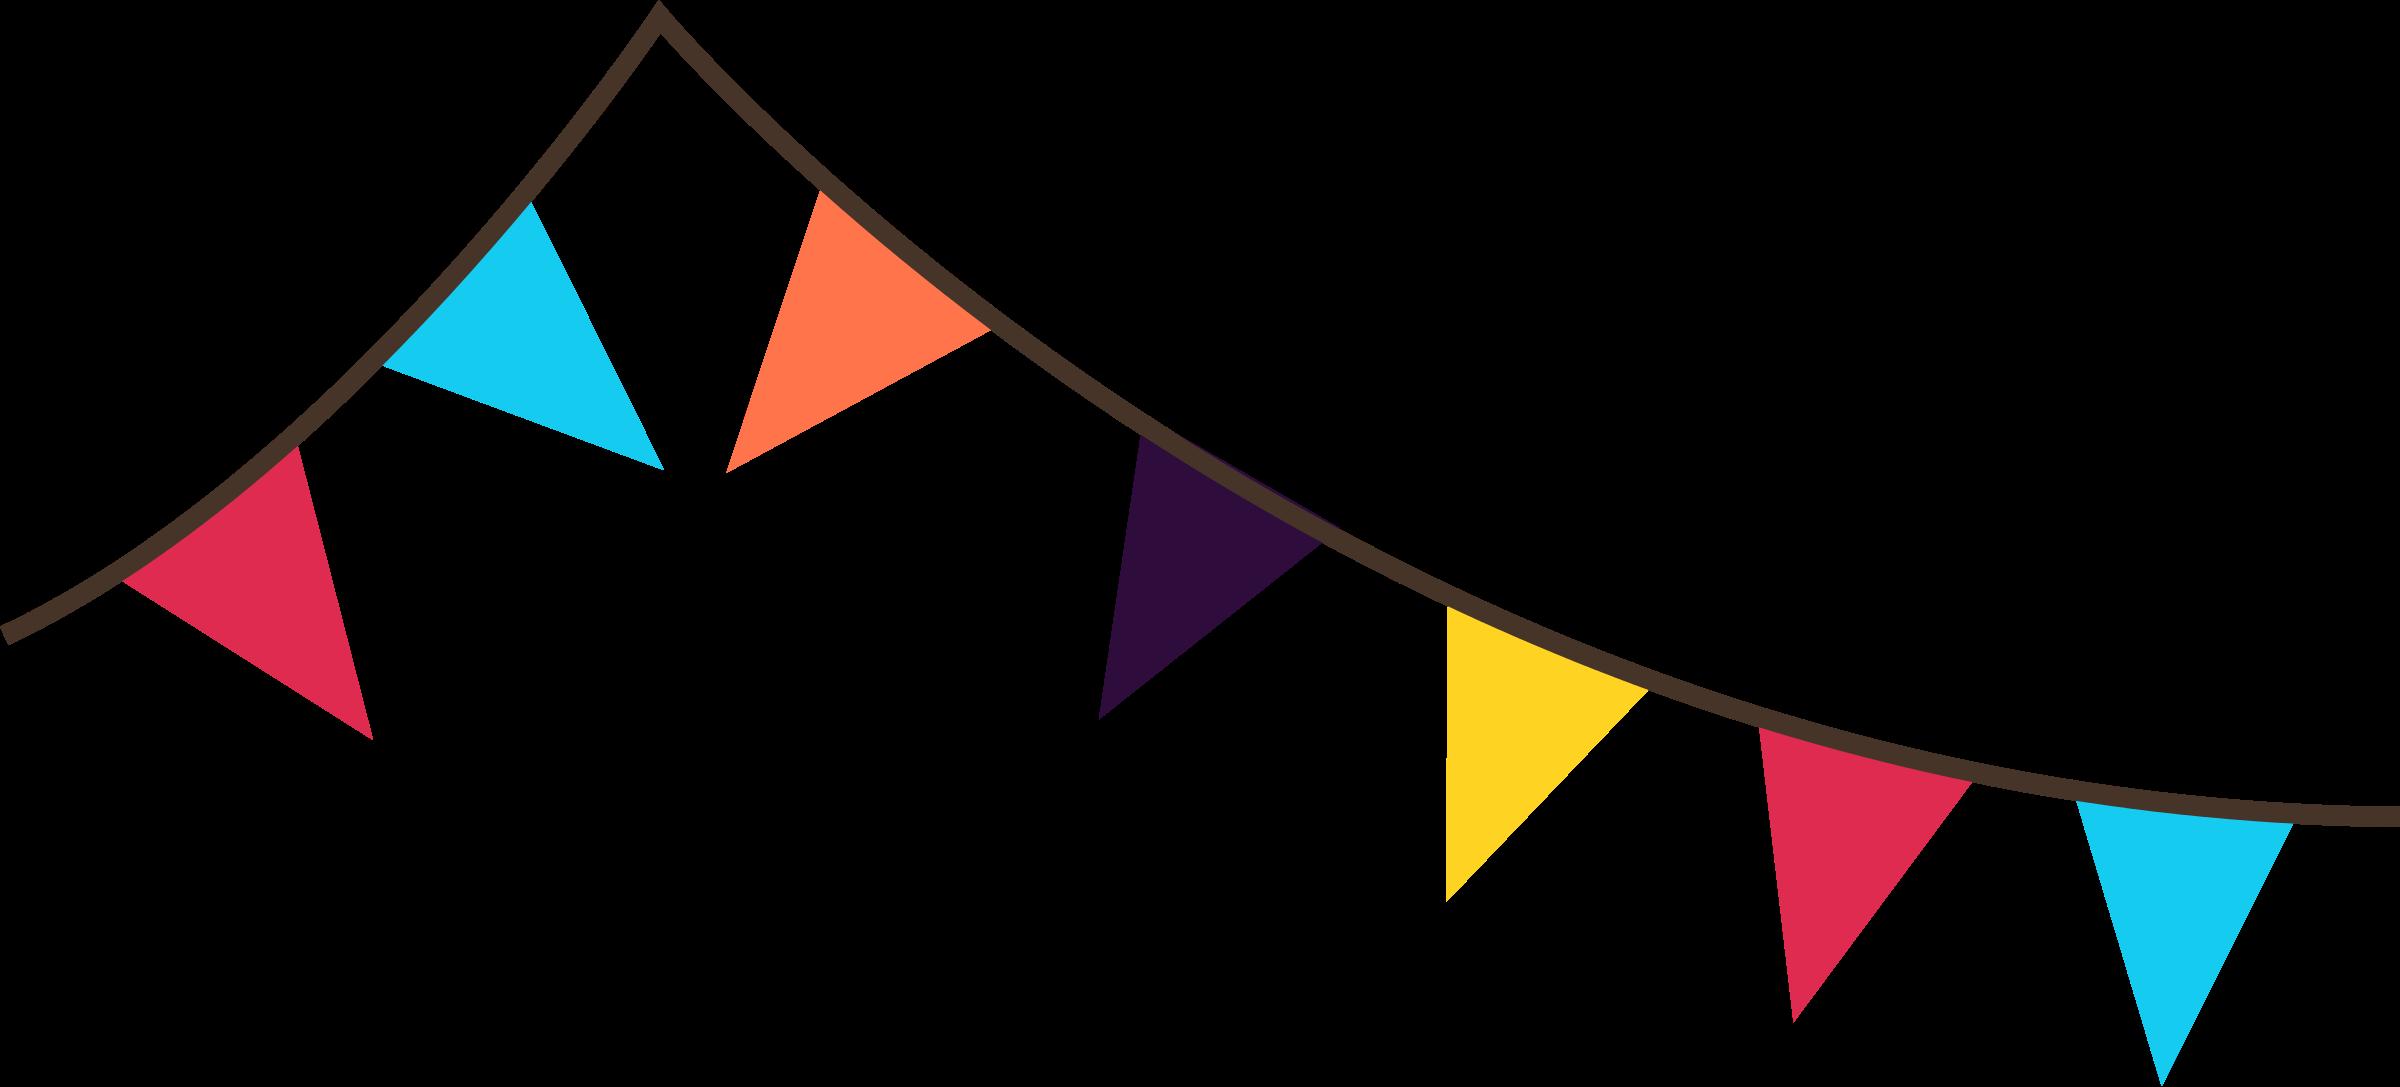 2400x1087 Carnival Clipart Flag Banner